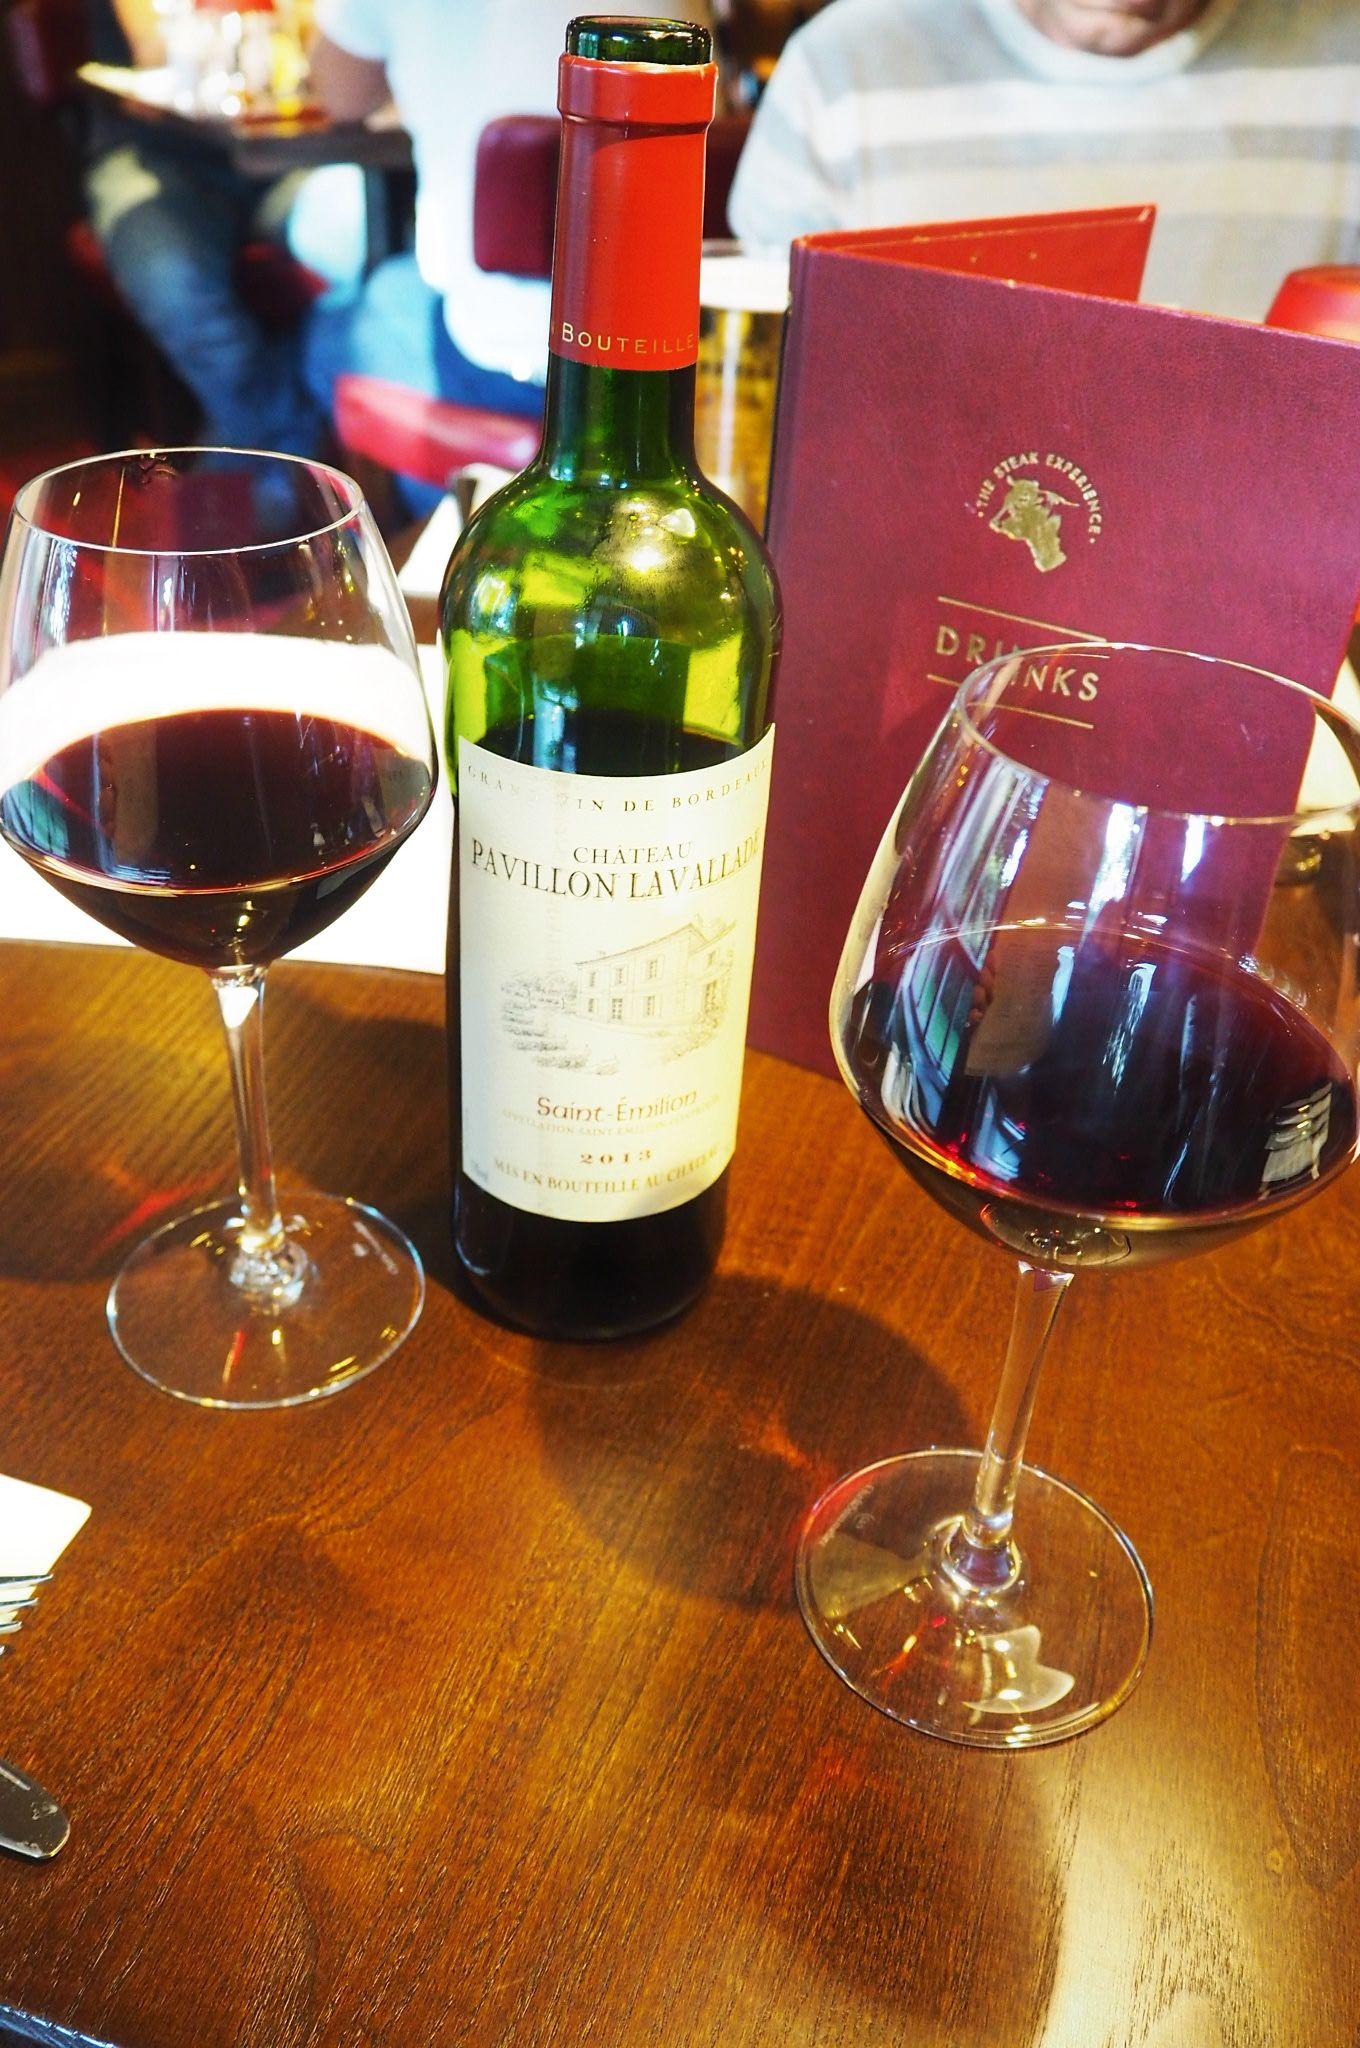 Bottle of red wine Miller and Carter steakhouse Milton Keynes